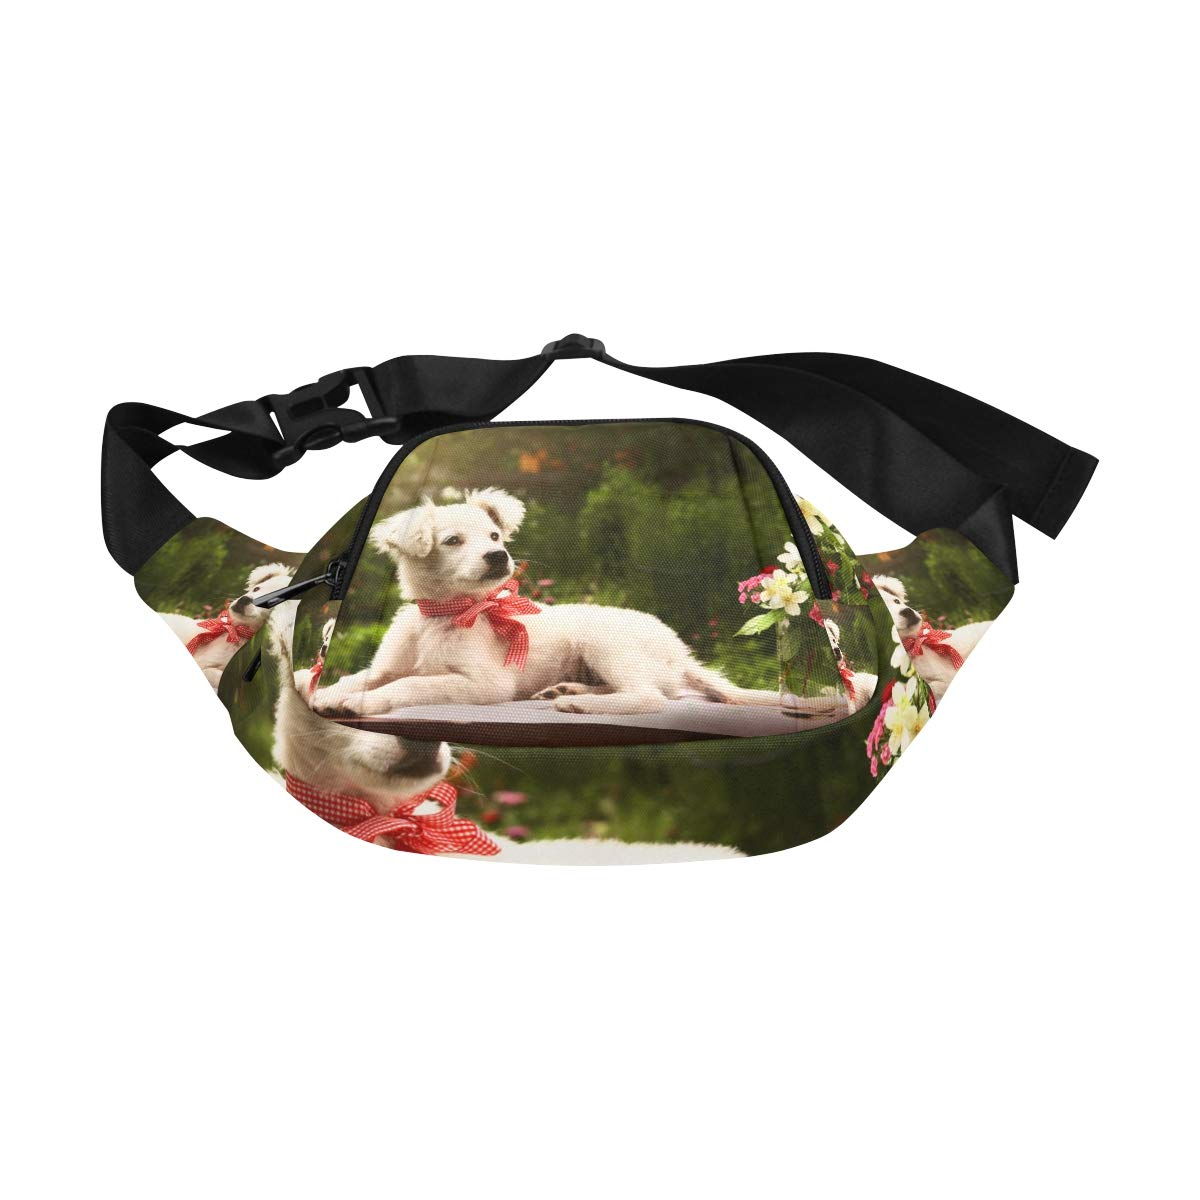 Lovely Dog And Tulip Bunch In Vase Fenny Packs Waist Bags Adjustable Belt Waterproof Nylon Travel Running Sport Vacation Party For Men Women Boys Girls Kids